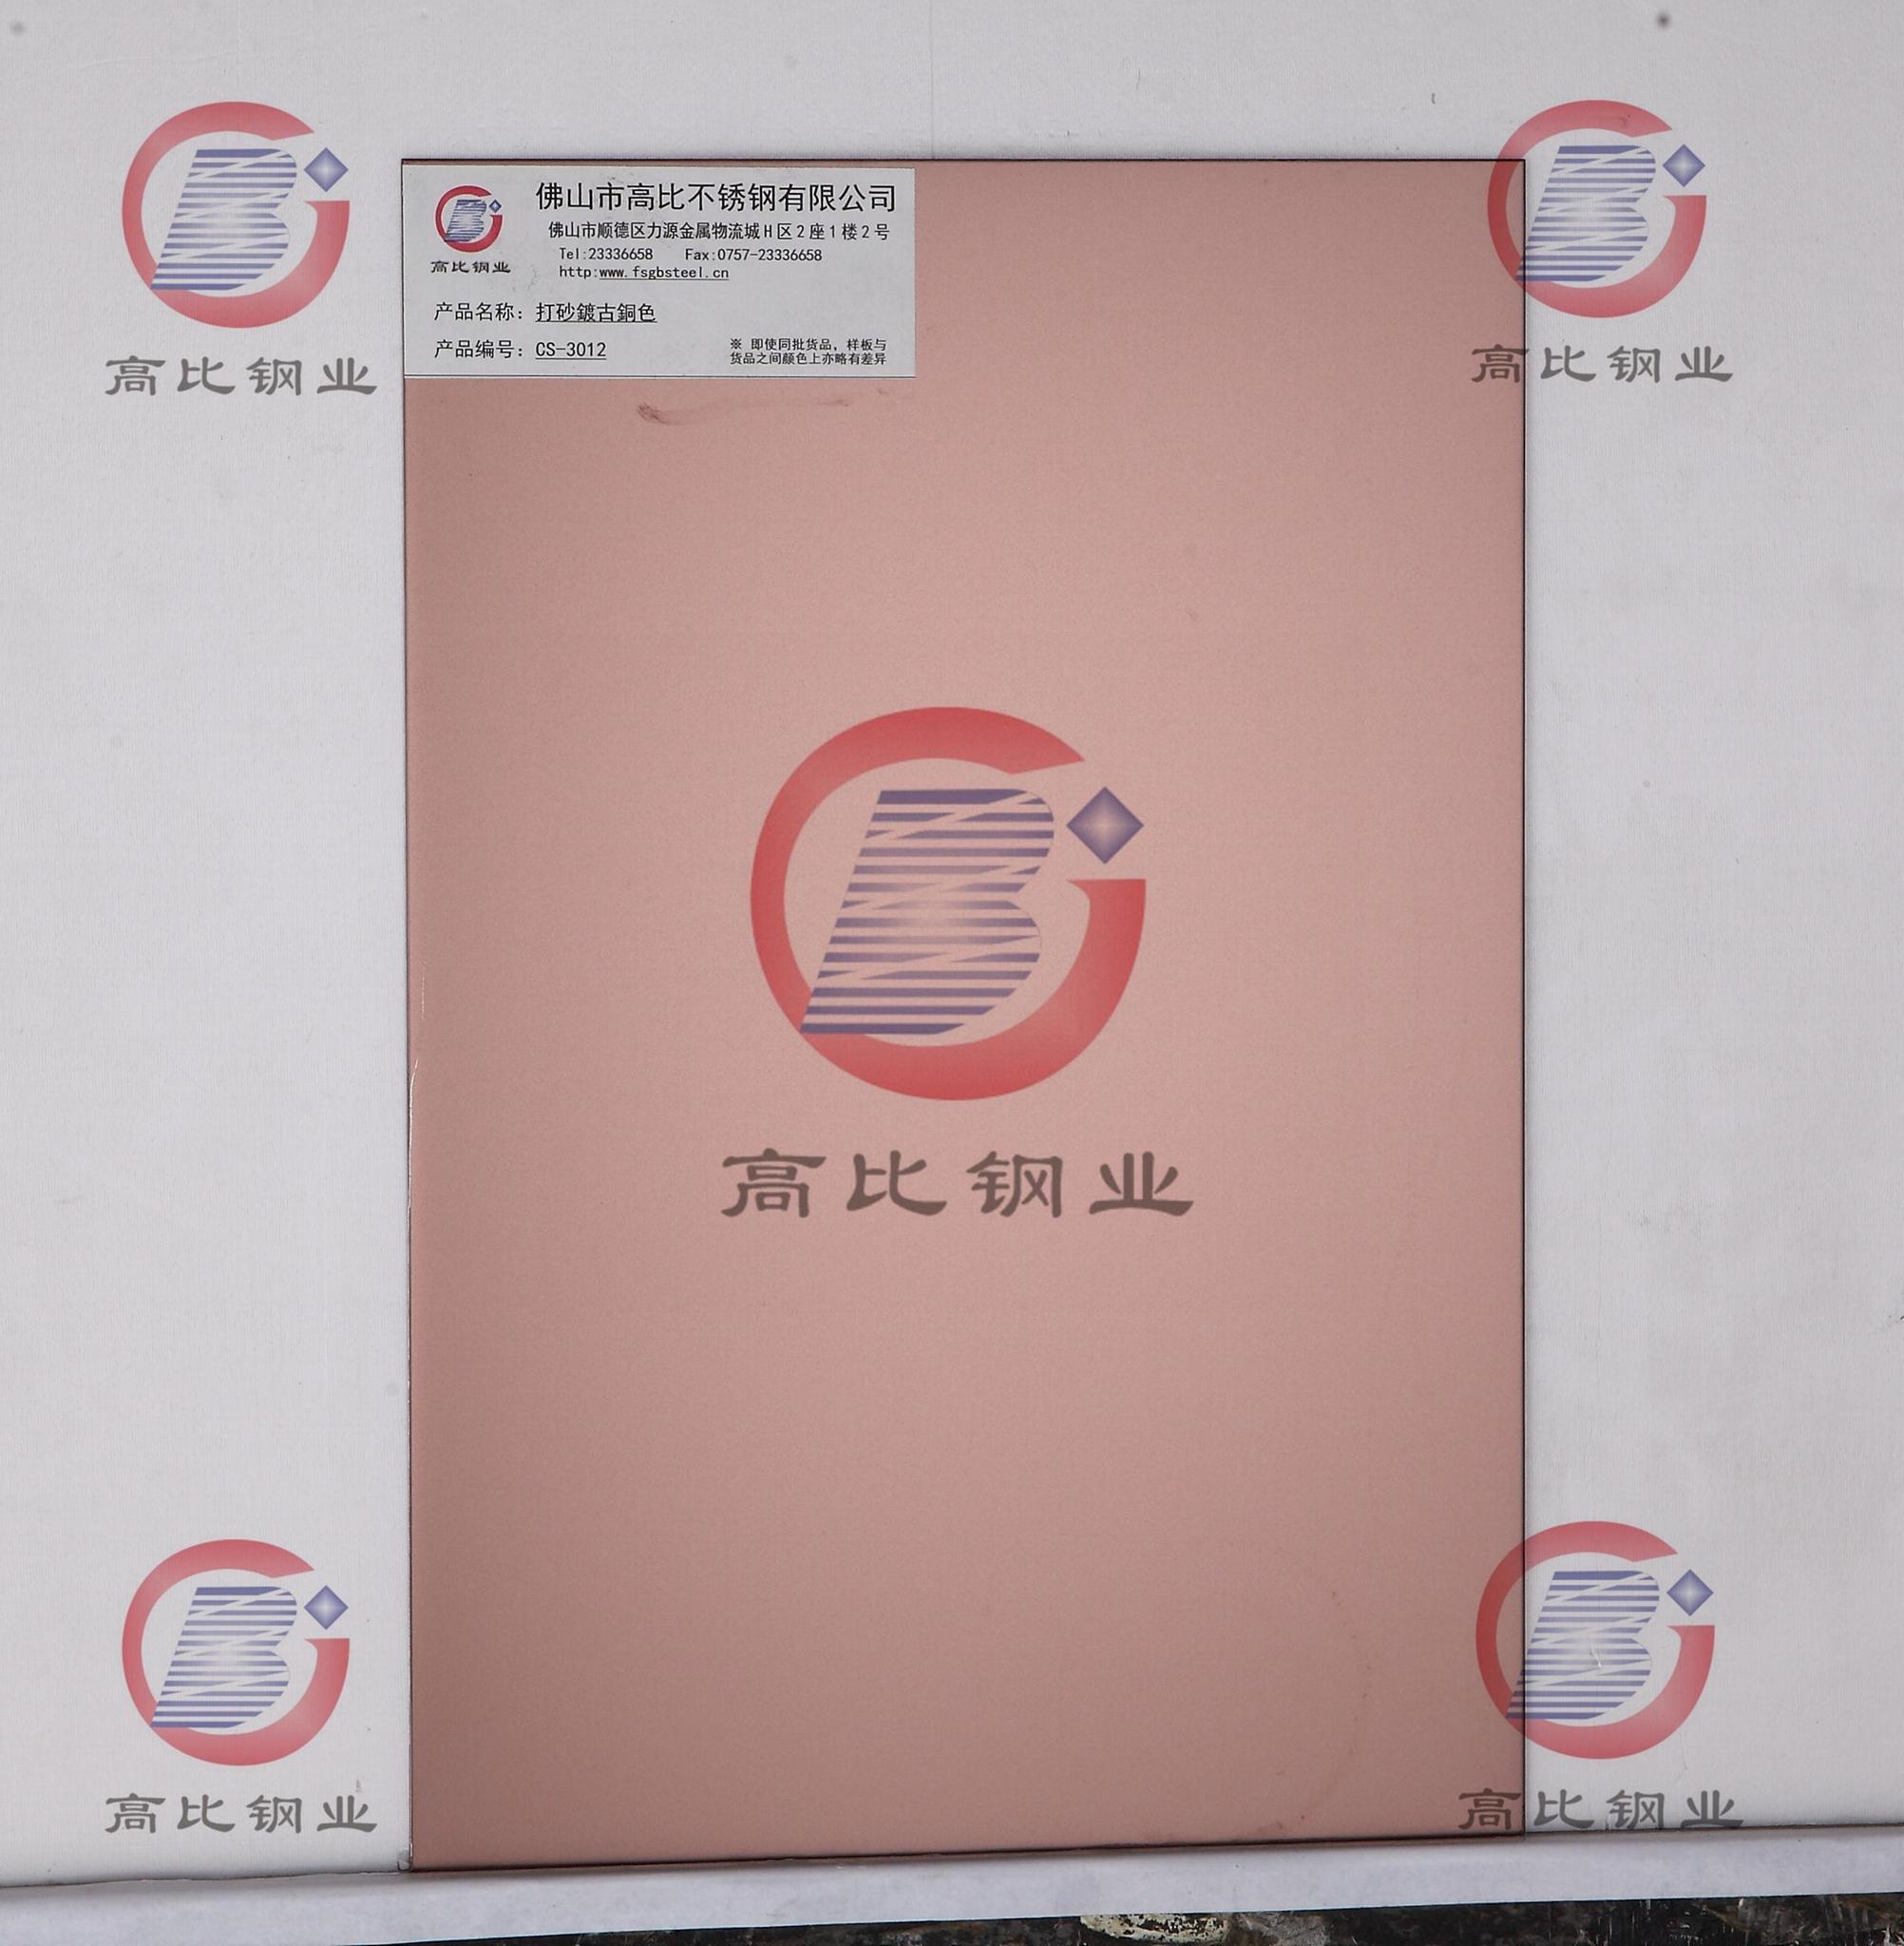 CS-3012 打砂镀古铜 高比彩色不锈钢板总代销 1